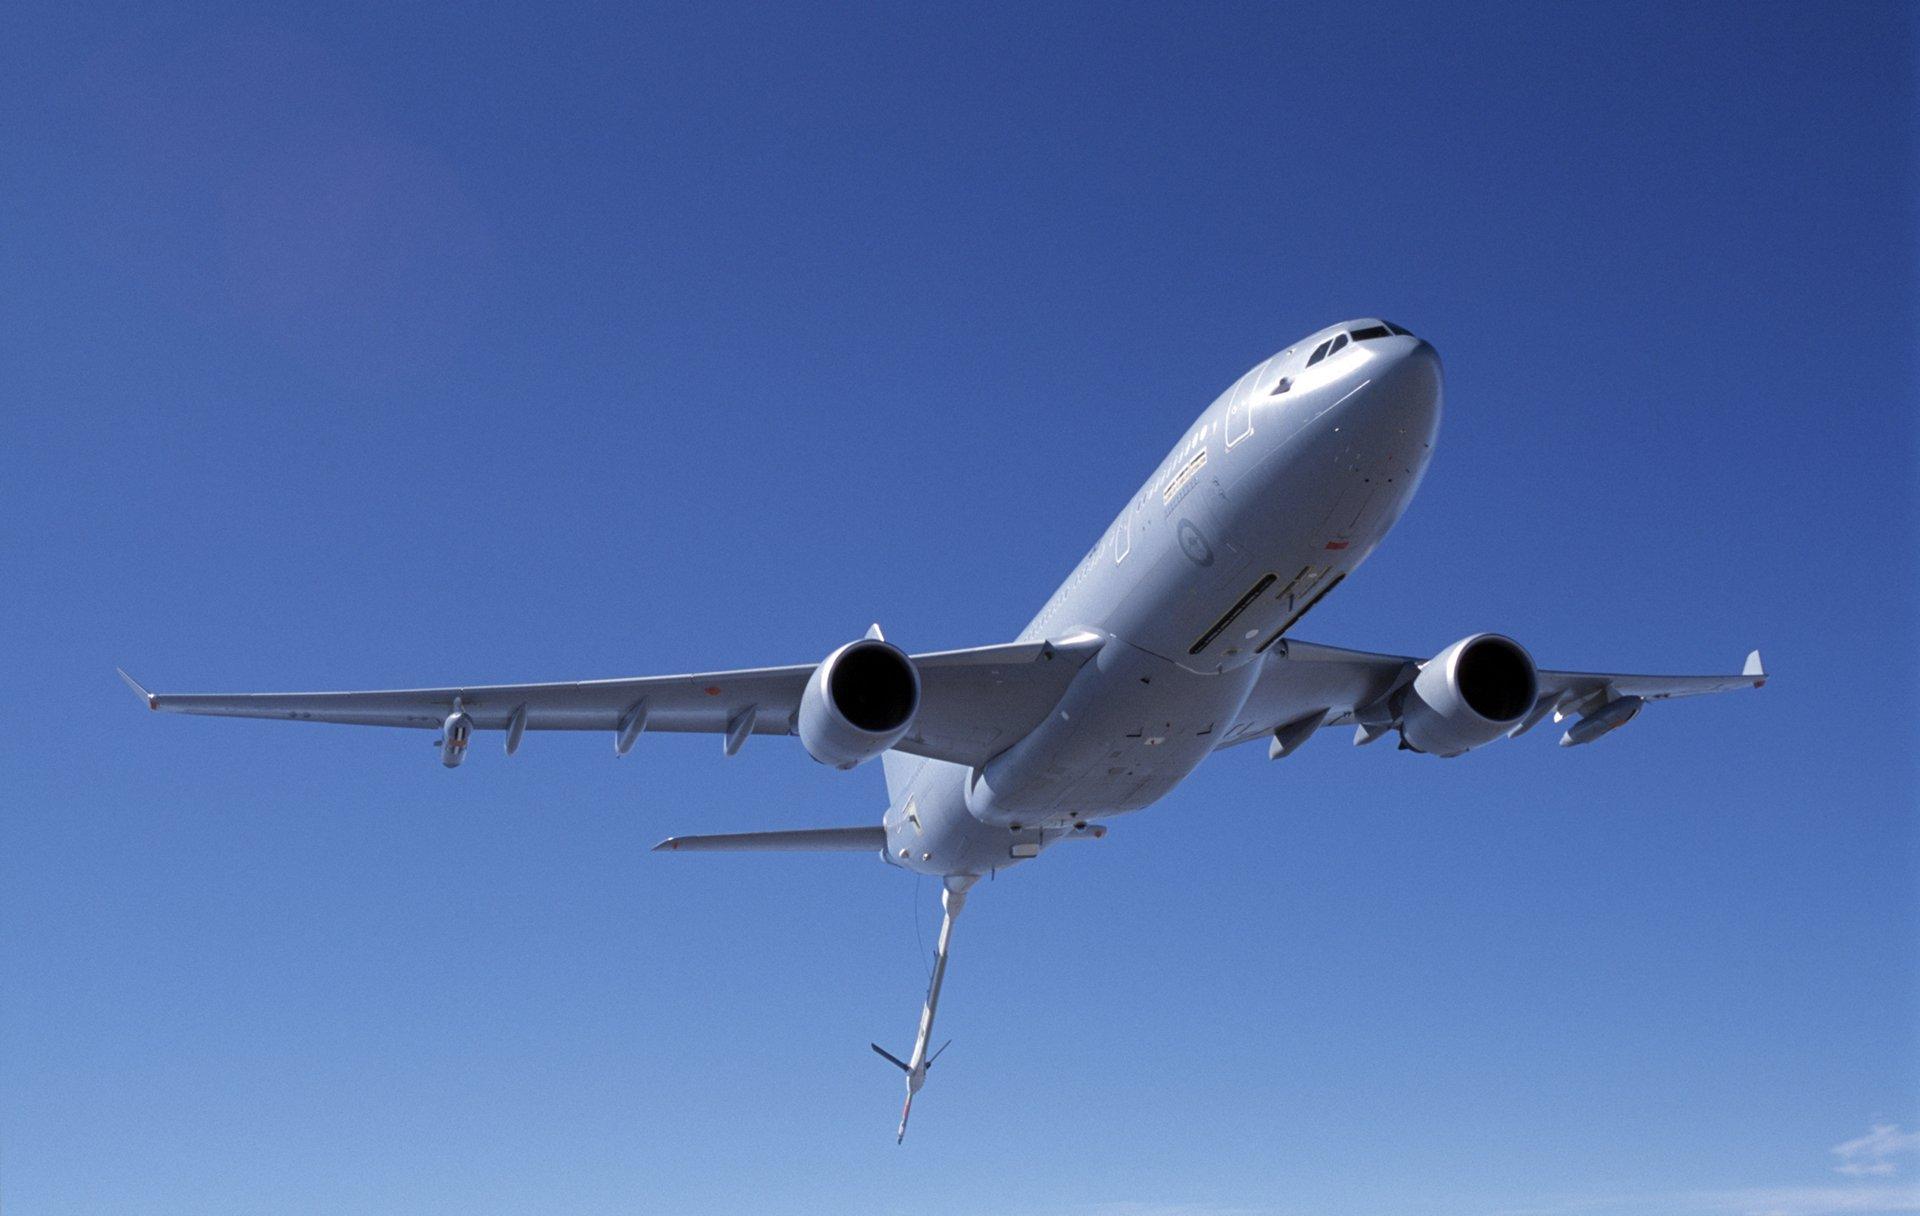 Royal Australian Air Force A330 MRTT